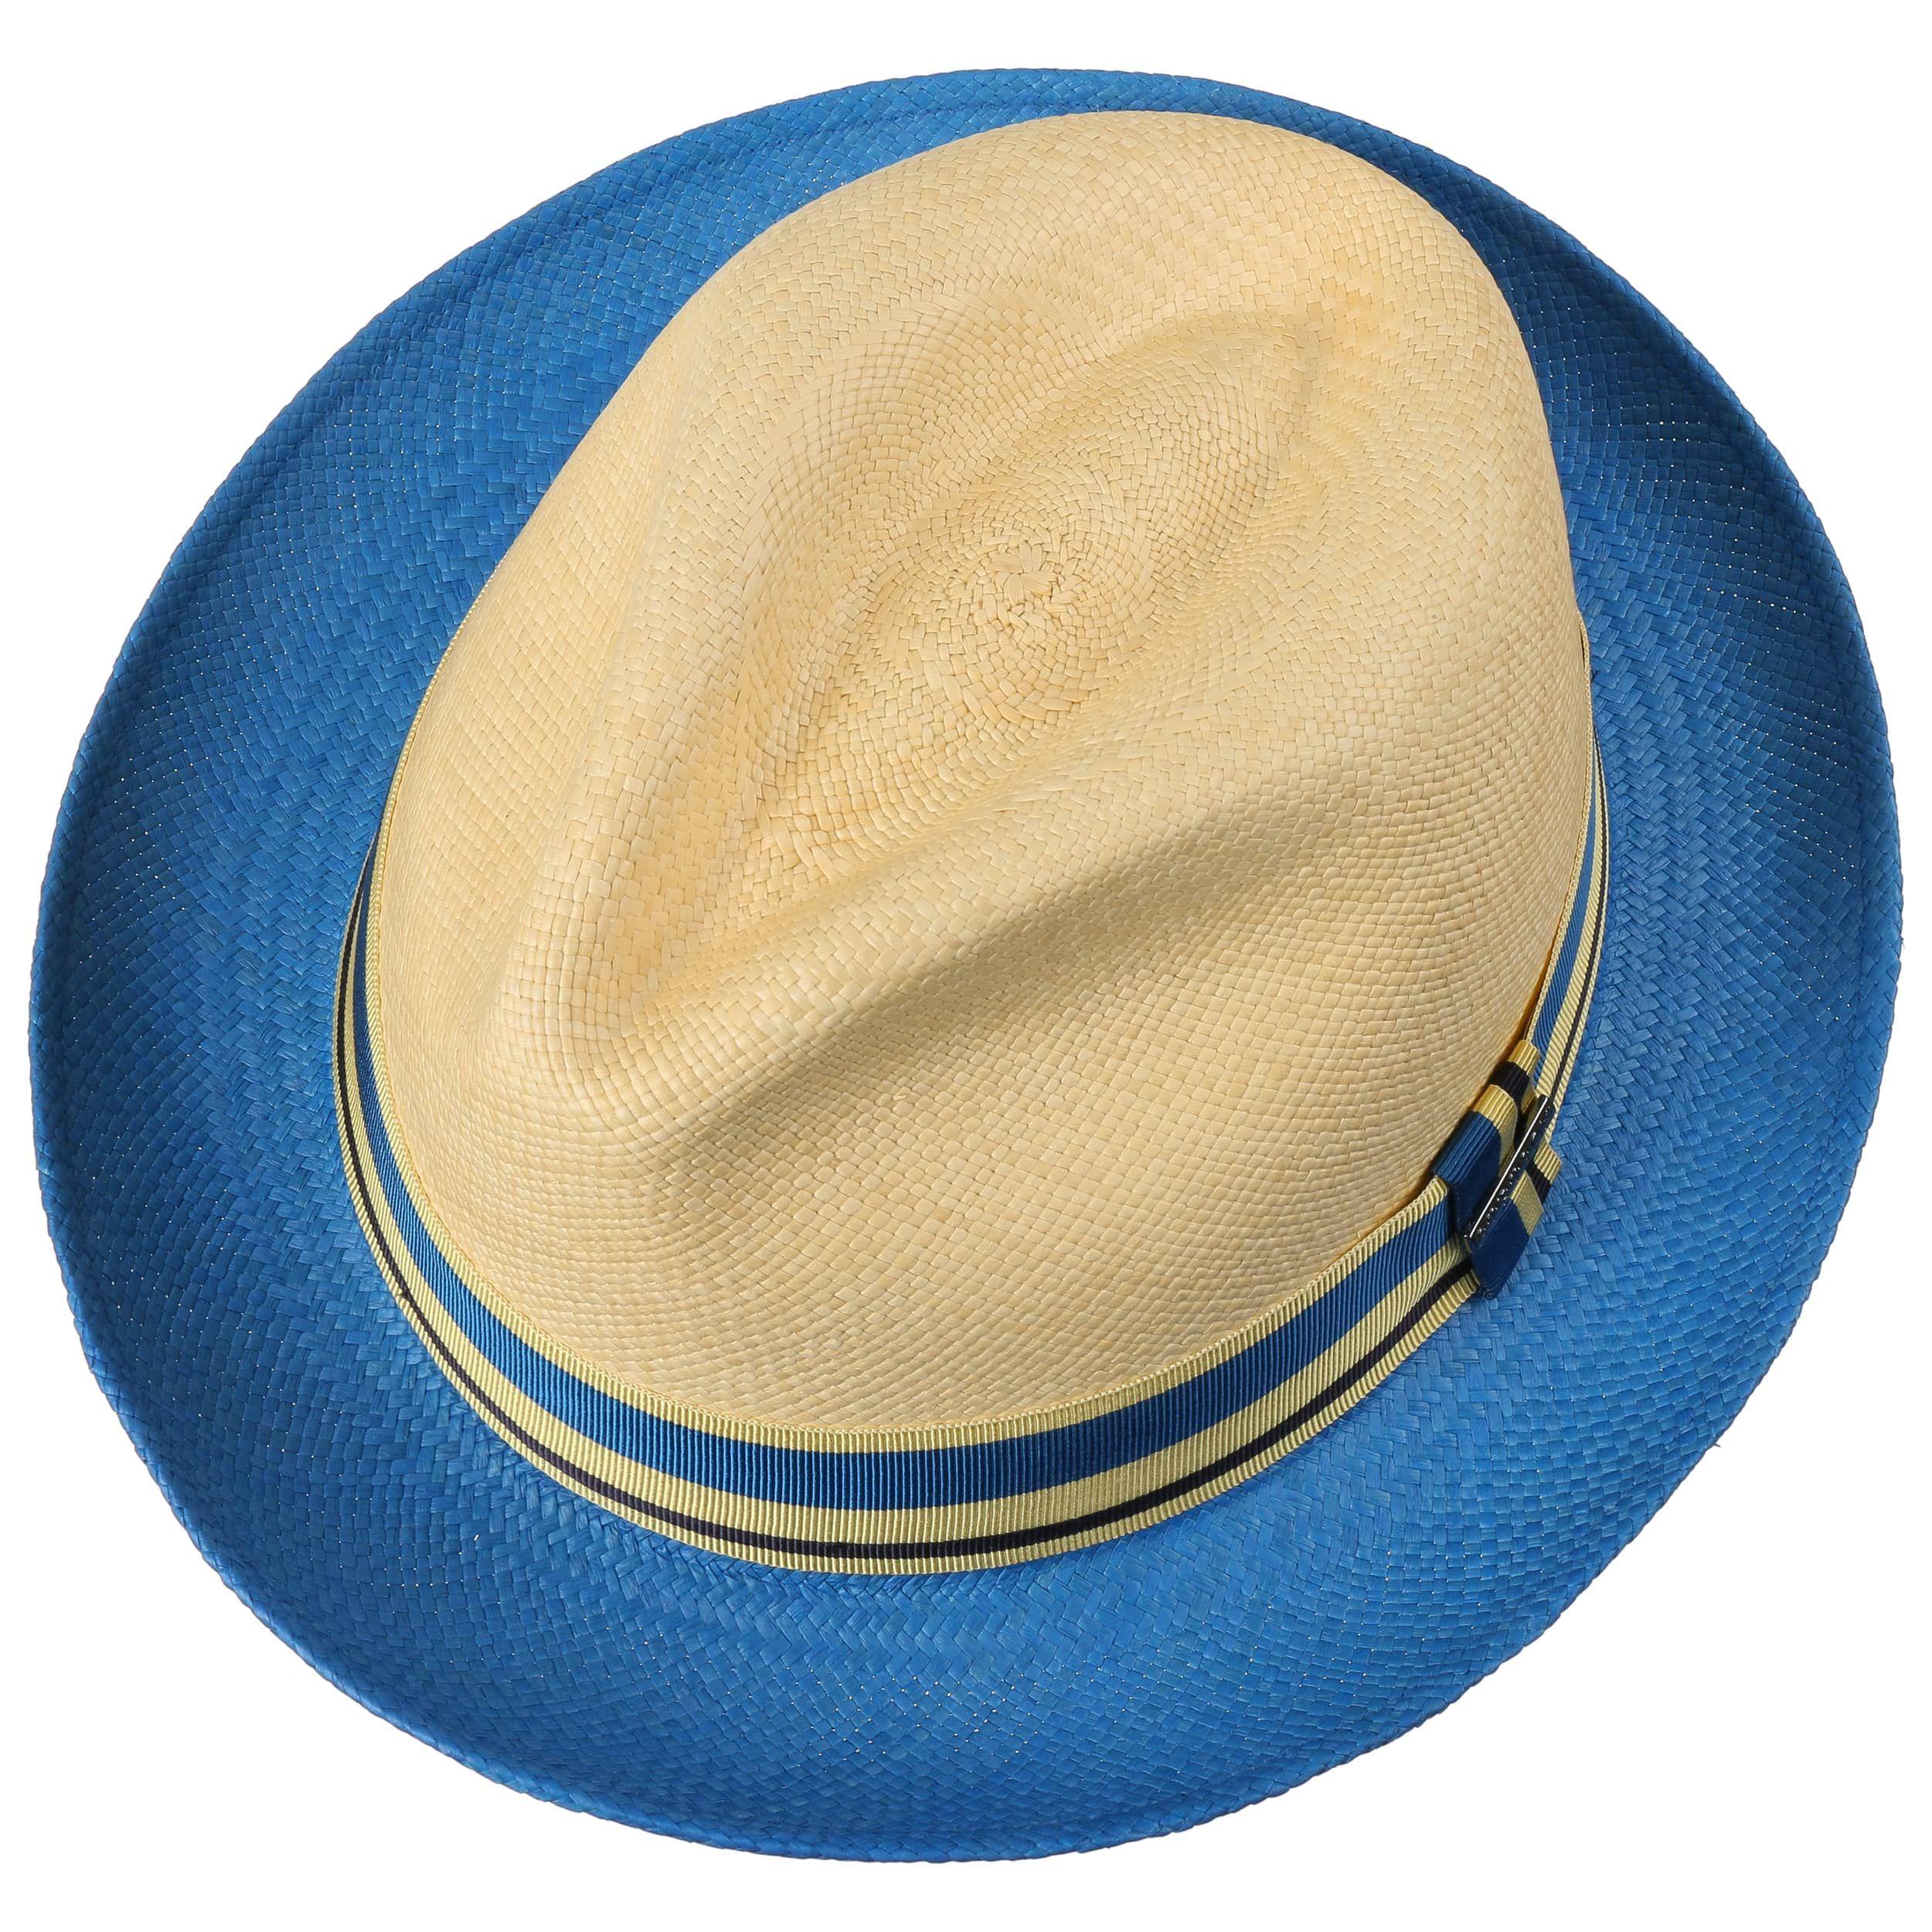 Recamo Player Panamahoed naturel-blauw